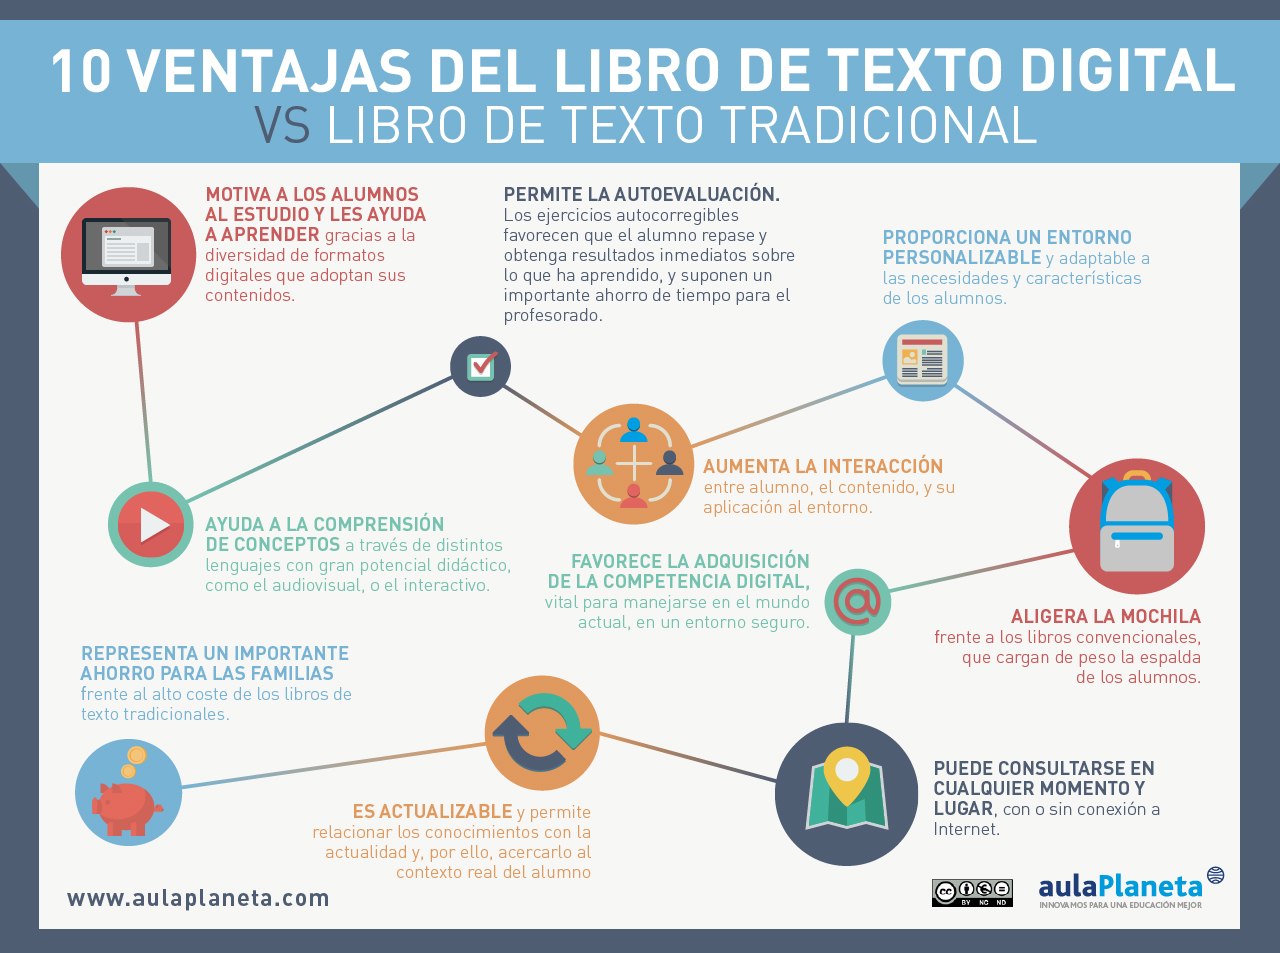 infografia-ventajas-digital